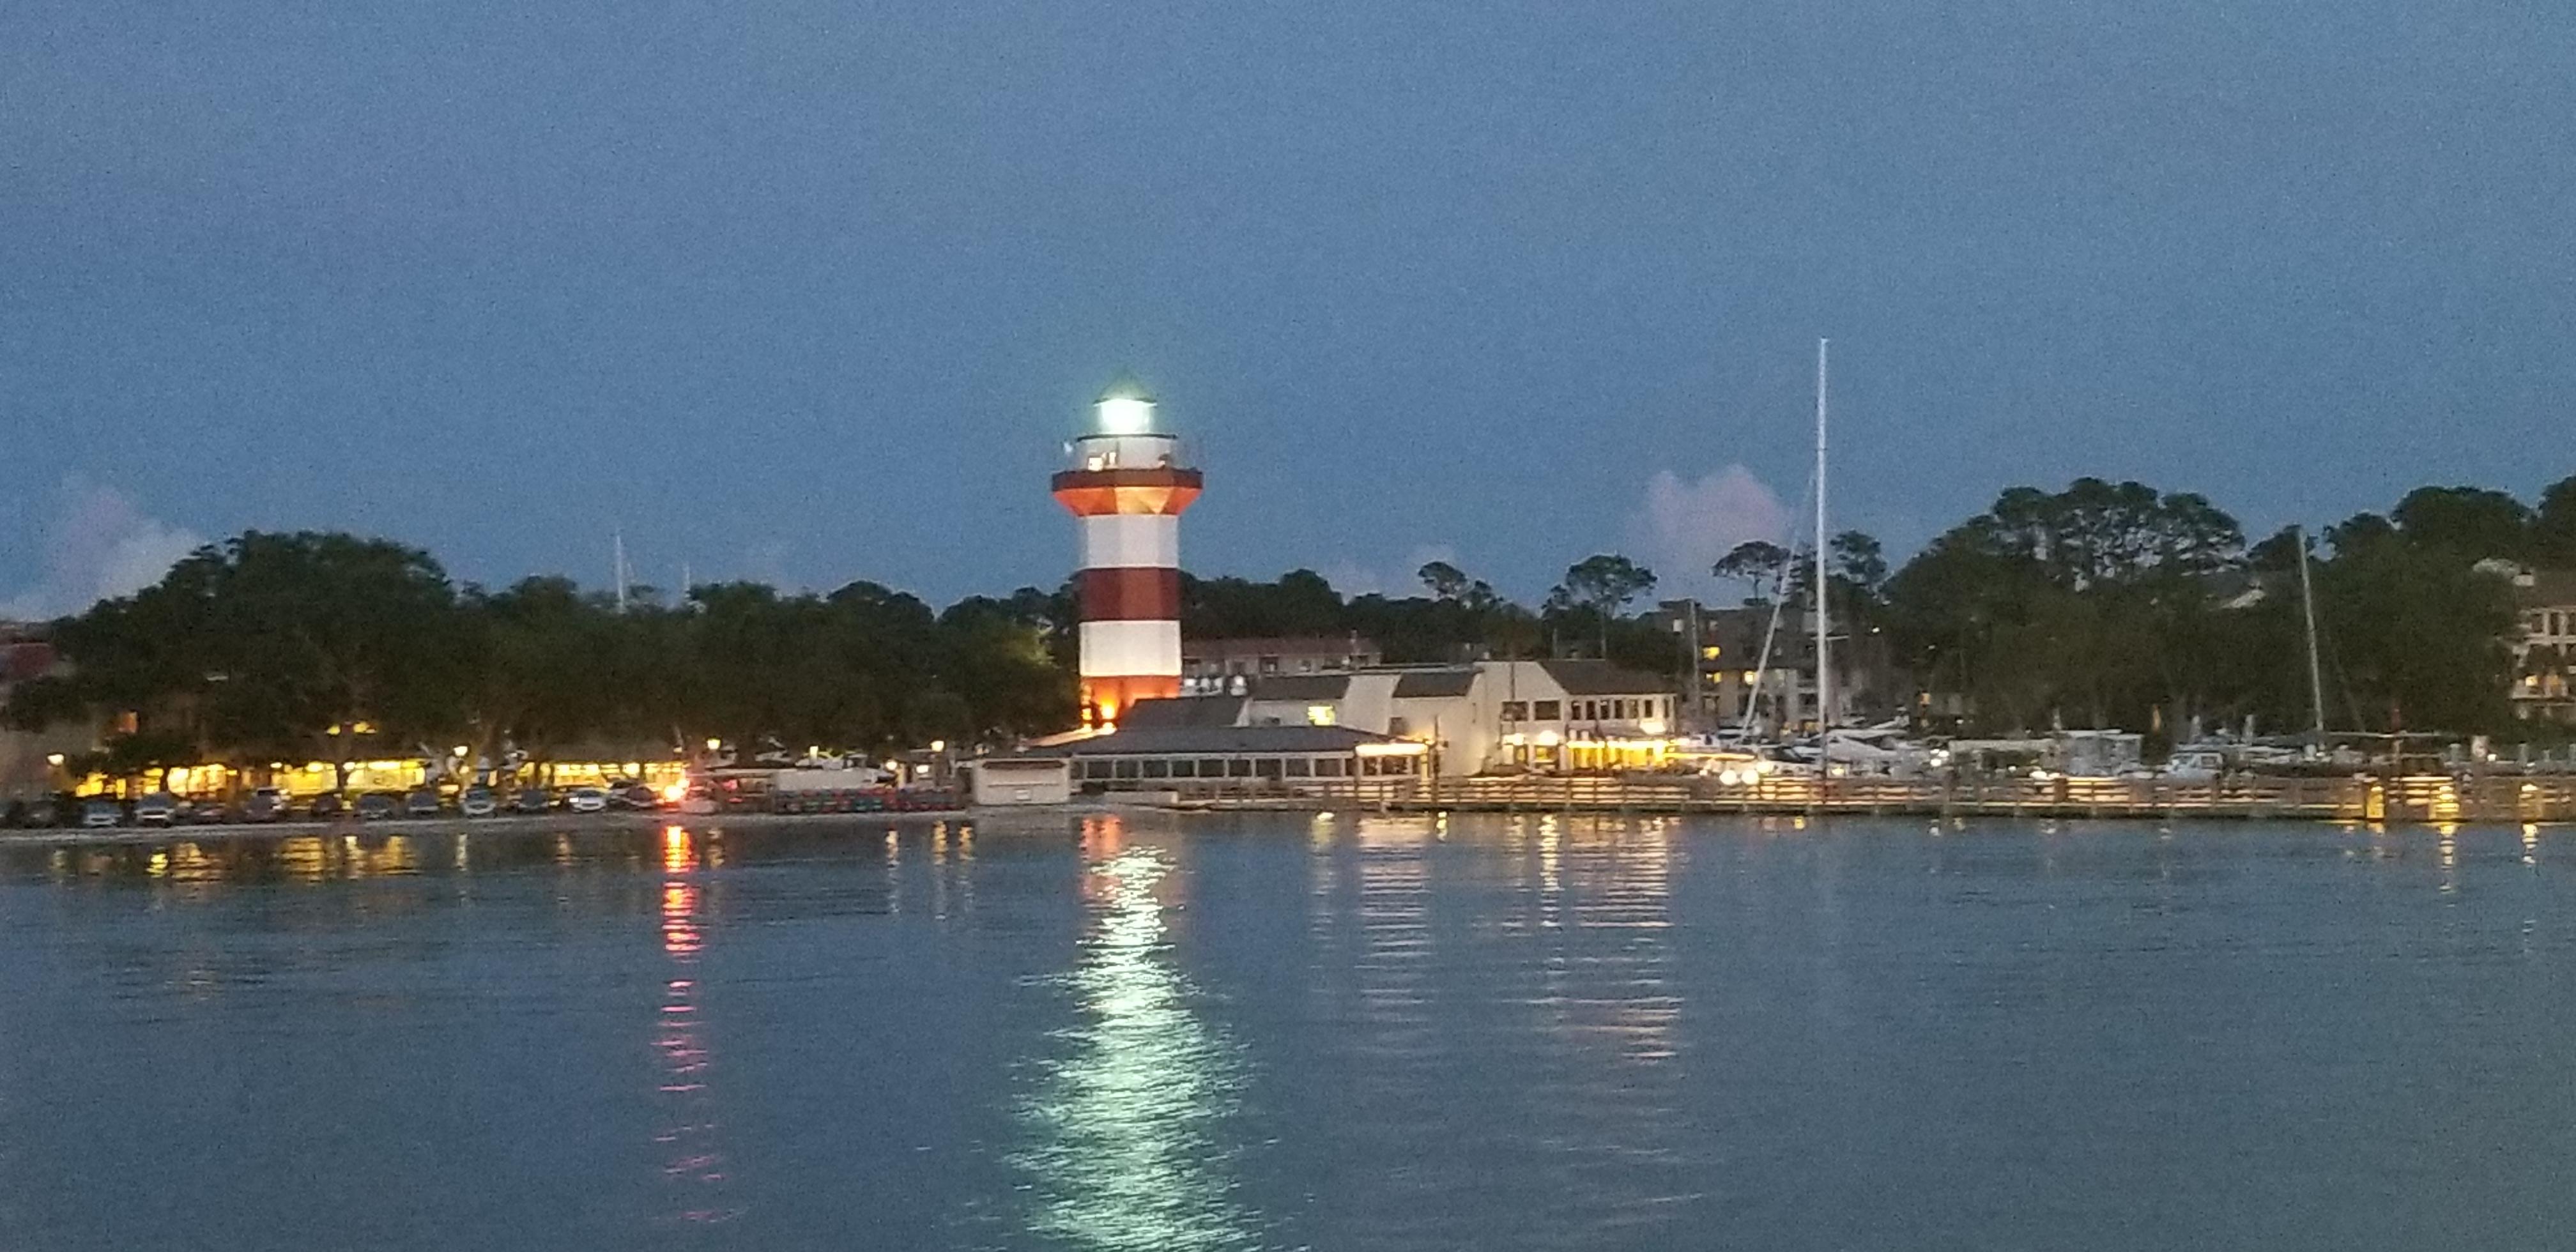 Hilton Head Island America's Hidden Gem